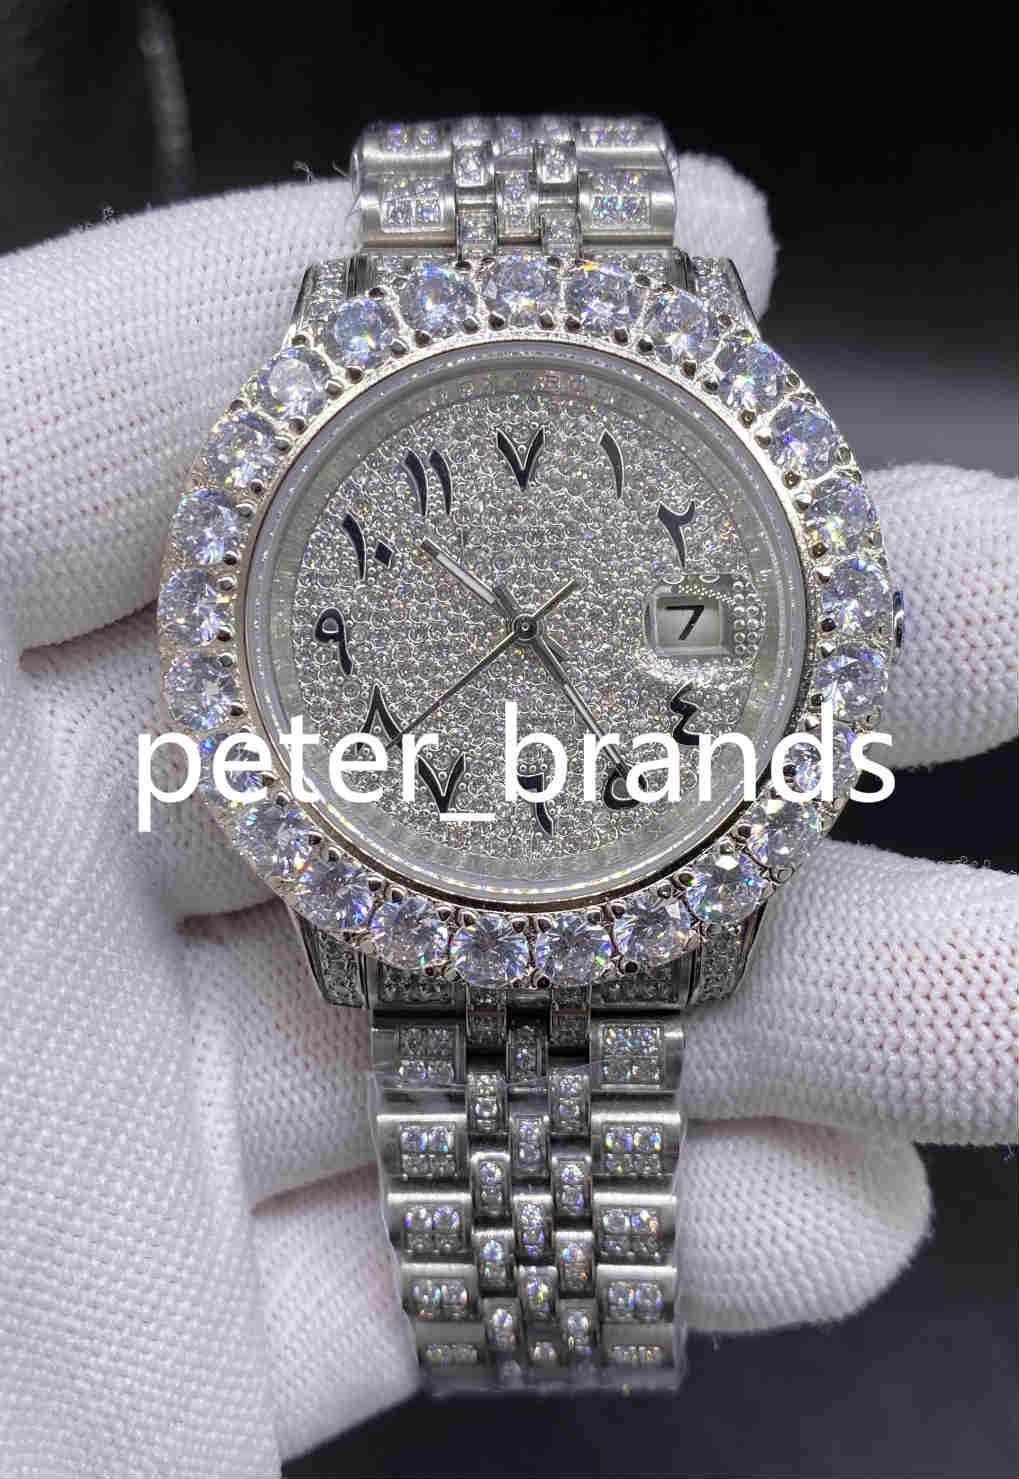 Dial Árabe Assista Diamond Watch Luxo Iced Out relógio automático 43MM Men prata impermeável inoxidável 316L Set CZ Diamante